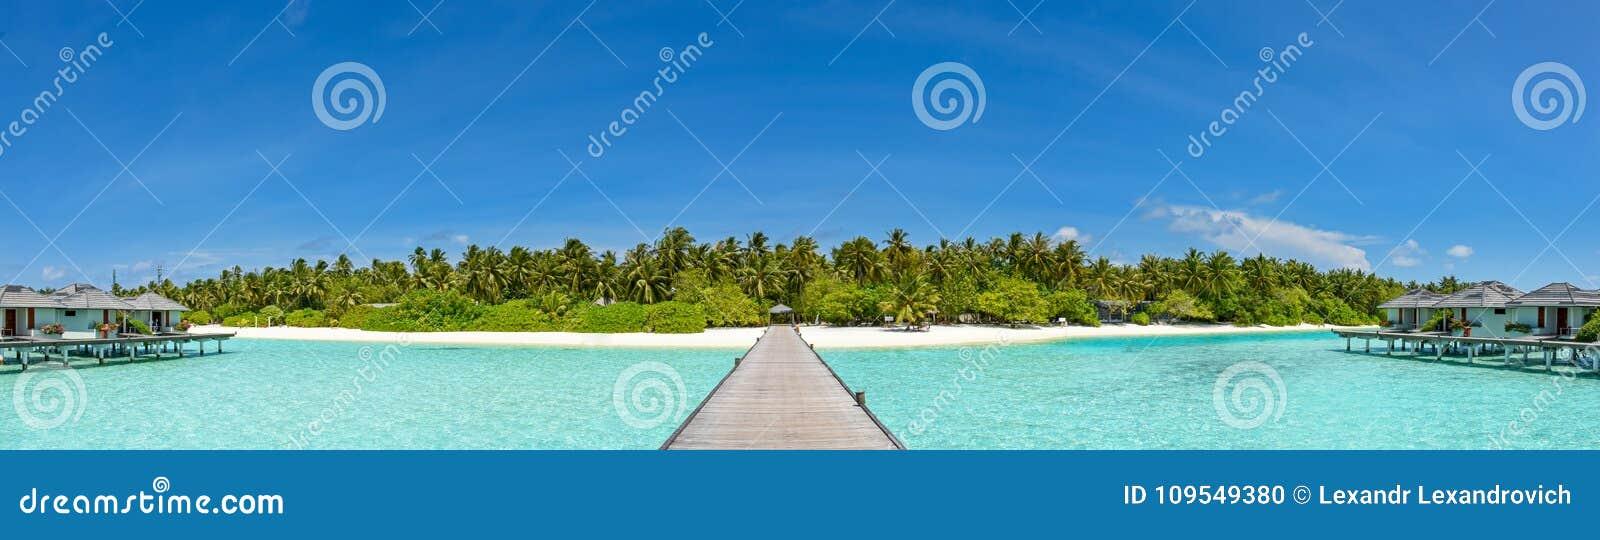 Schönes Panorama des Tropeninselerholungsortes bei Malediven